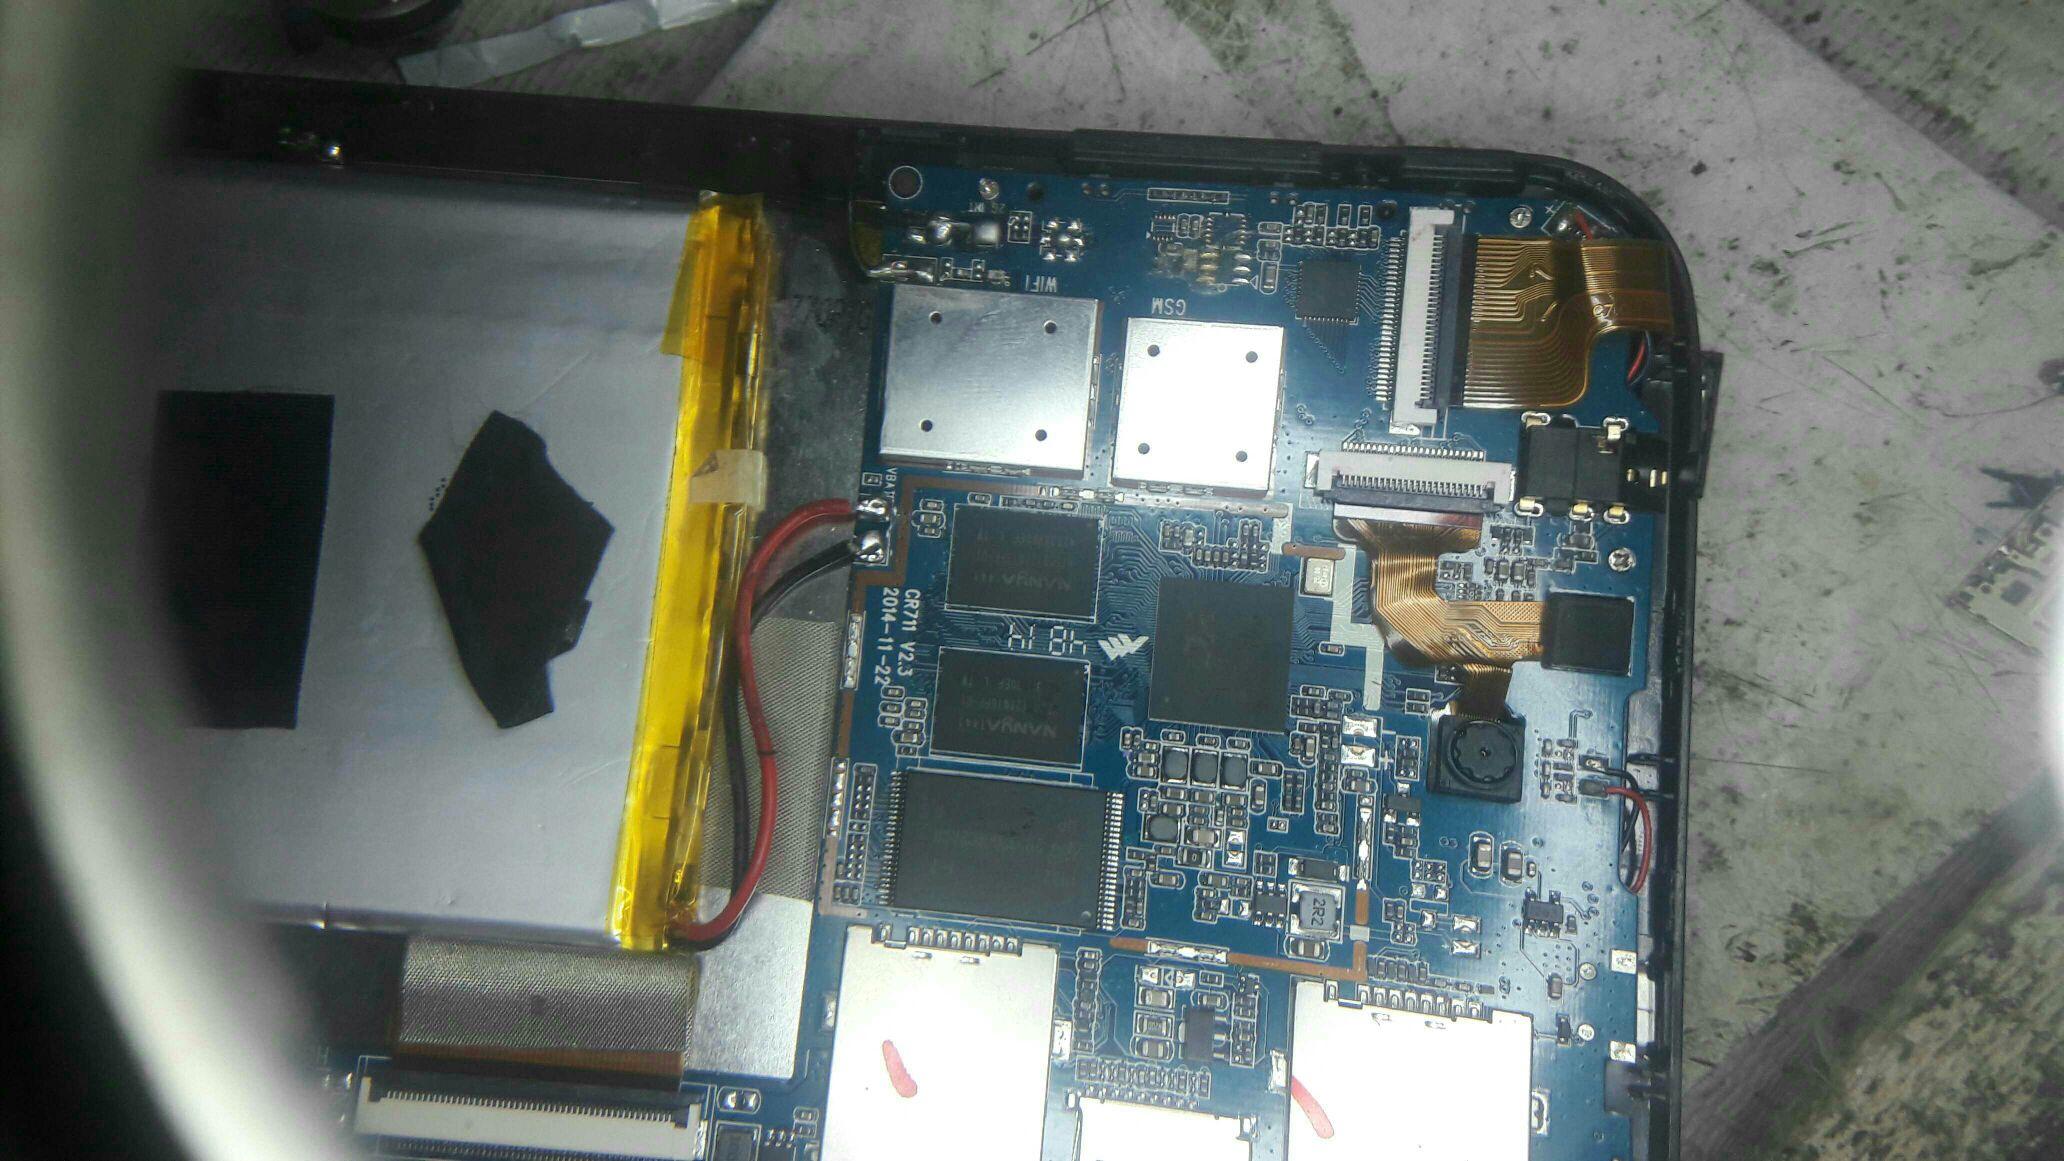 :فلاشـات: firmware Ubslate 7c+ TM   CR711 V2.3  25350c47fa95ac39a1320a4e5100b15b